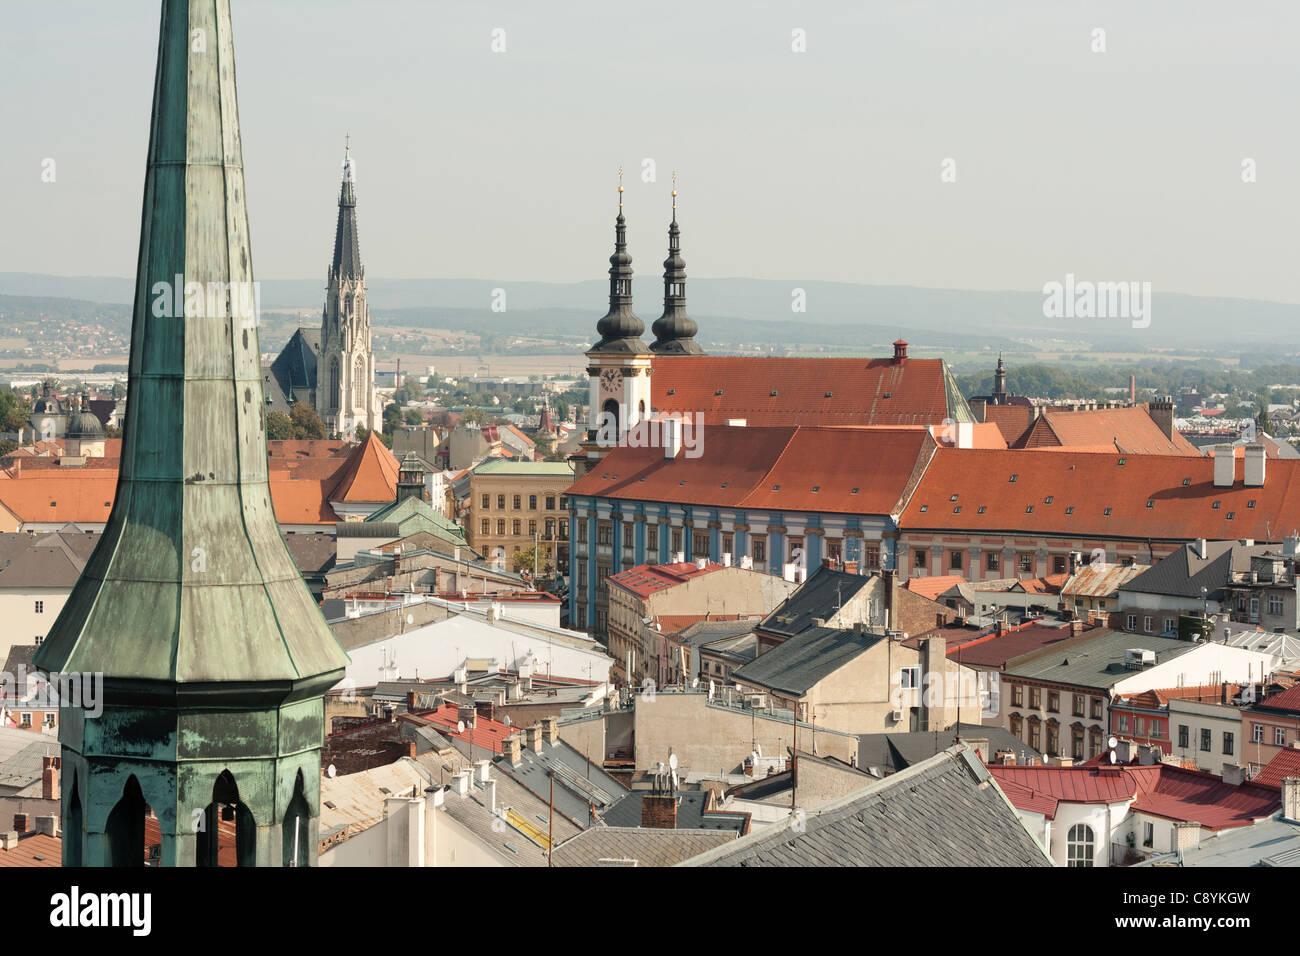 View of the city of Olomouc, Czech Republic - Stock Image